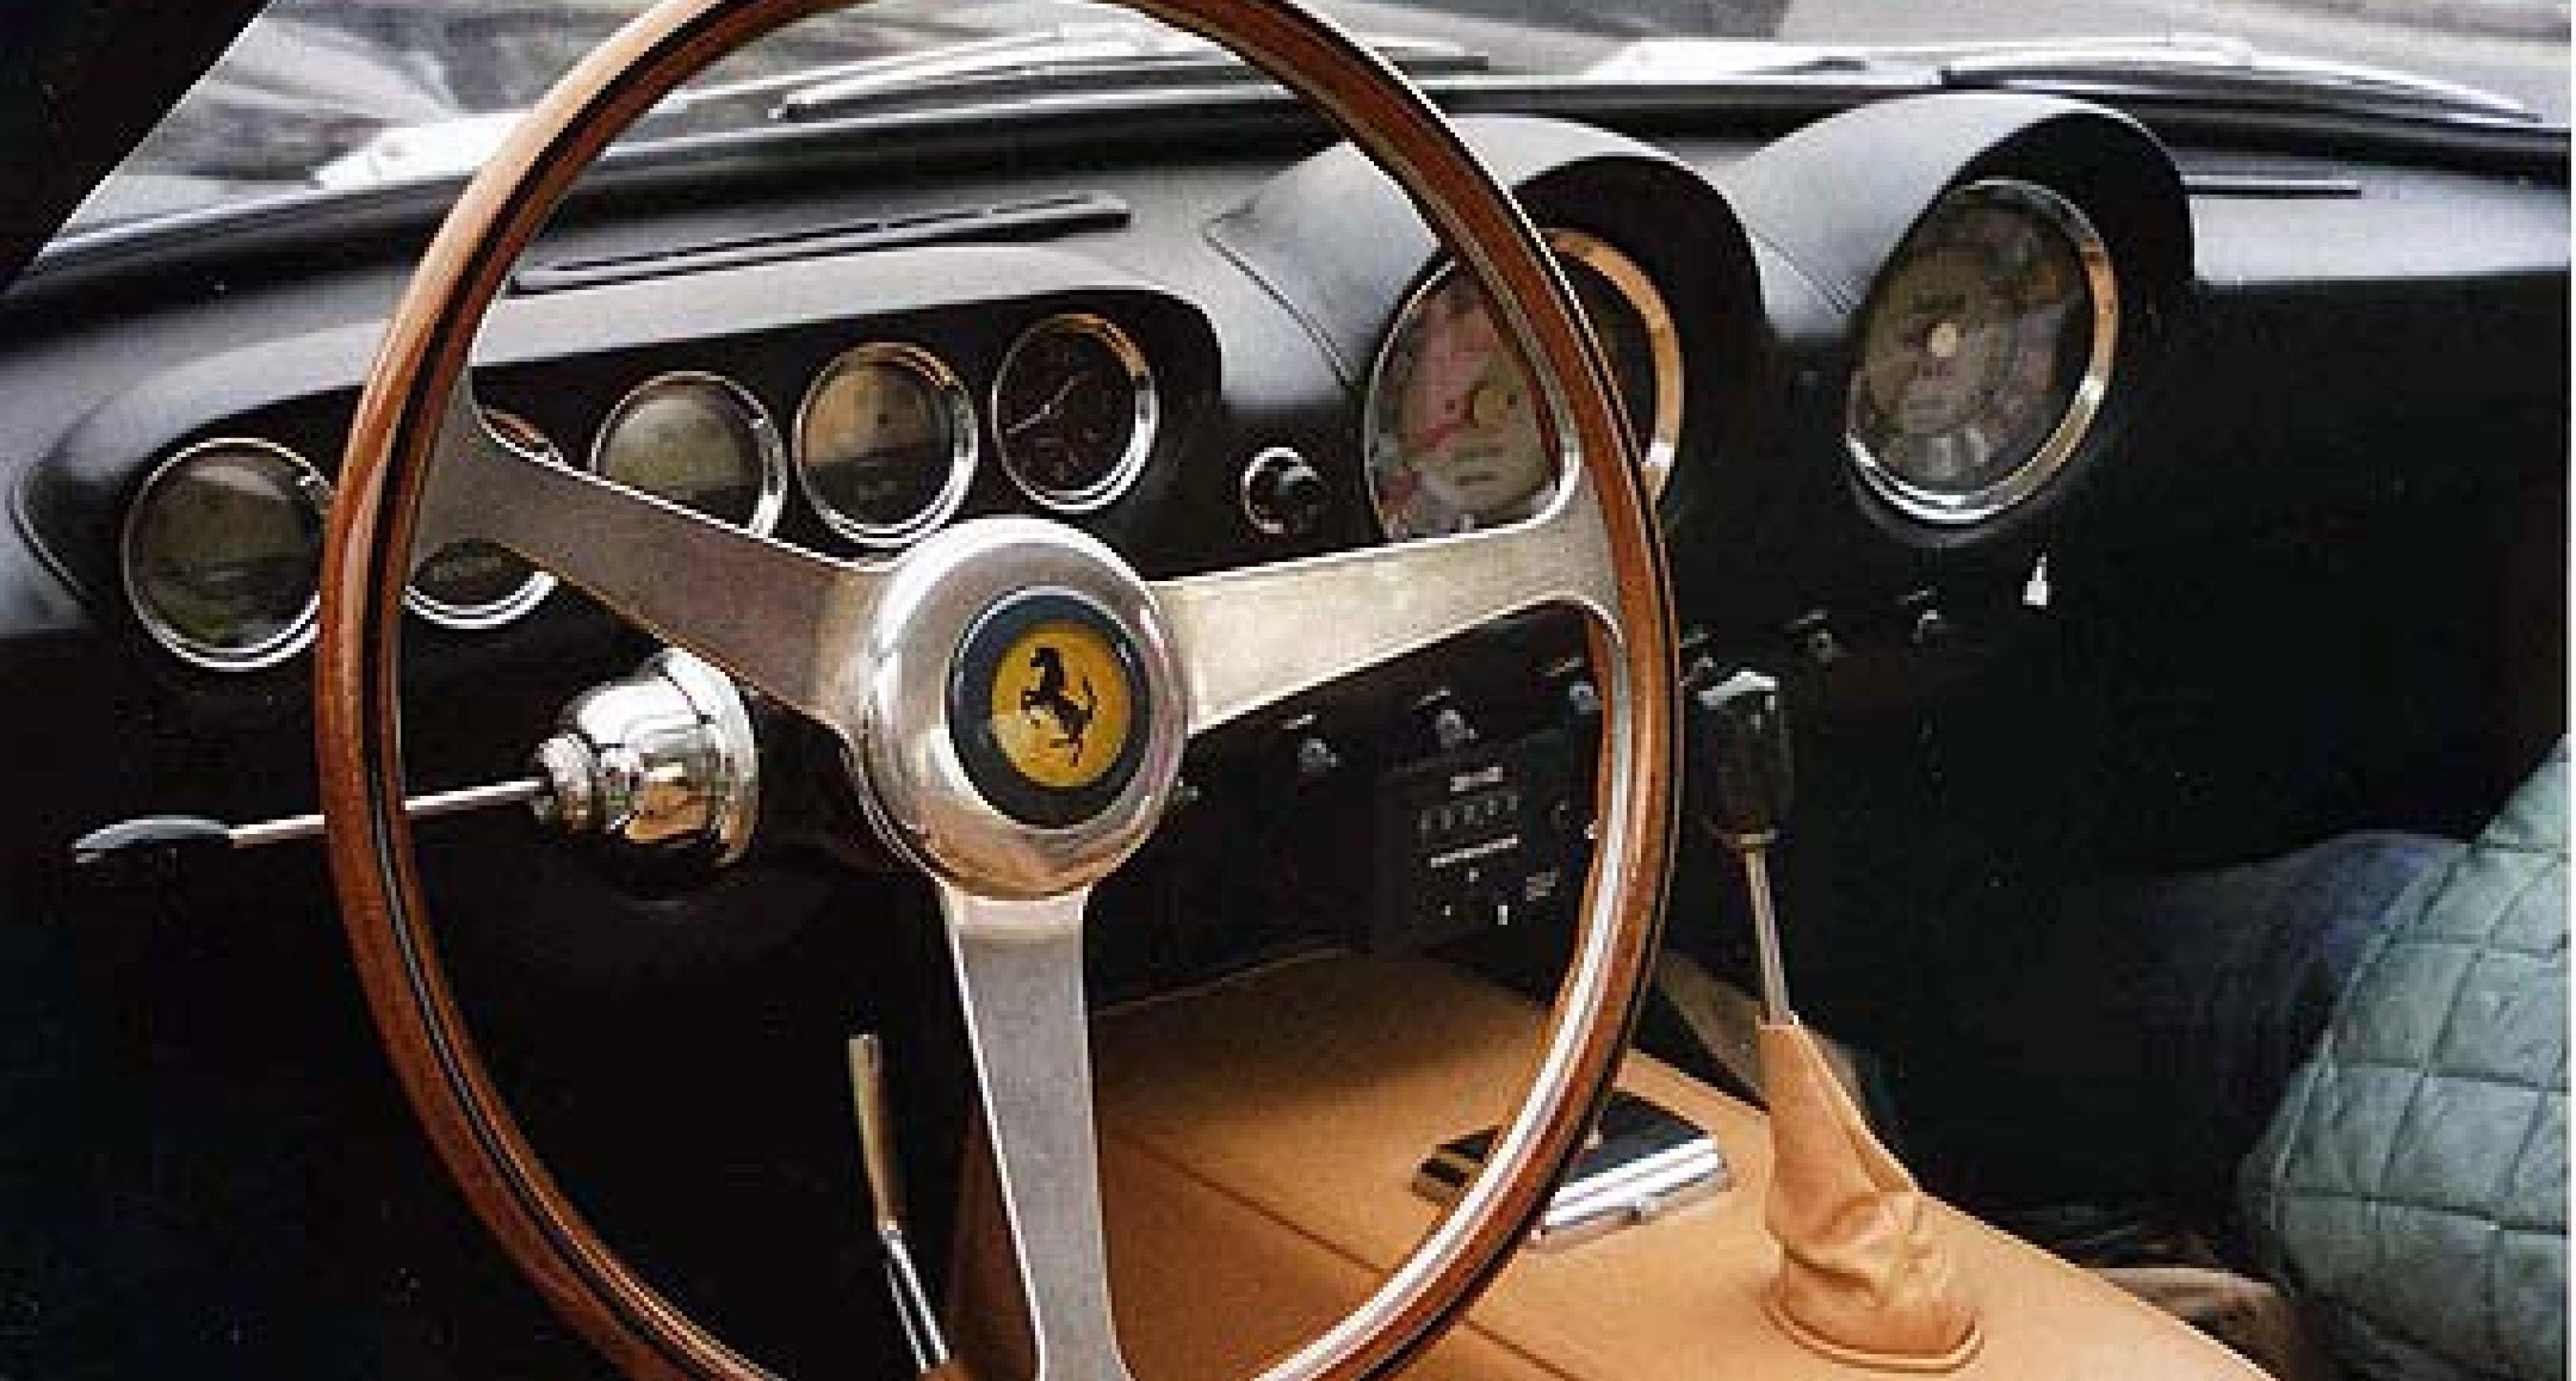 Ferrari Lusso, 275 GTS und Daytona (1)